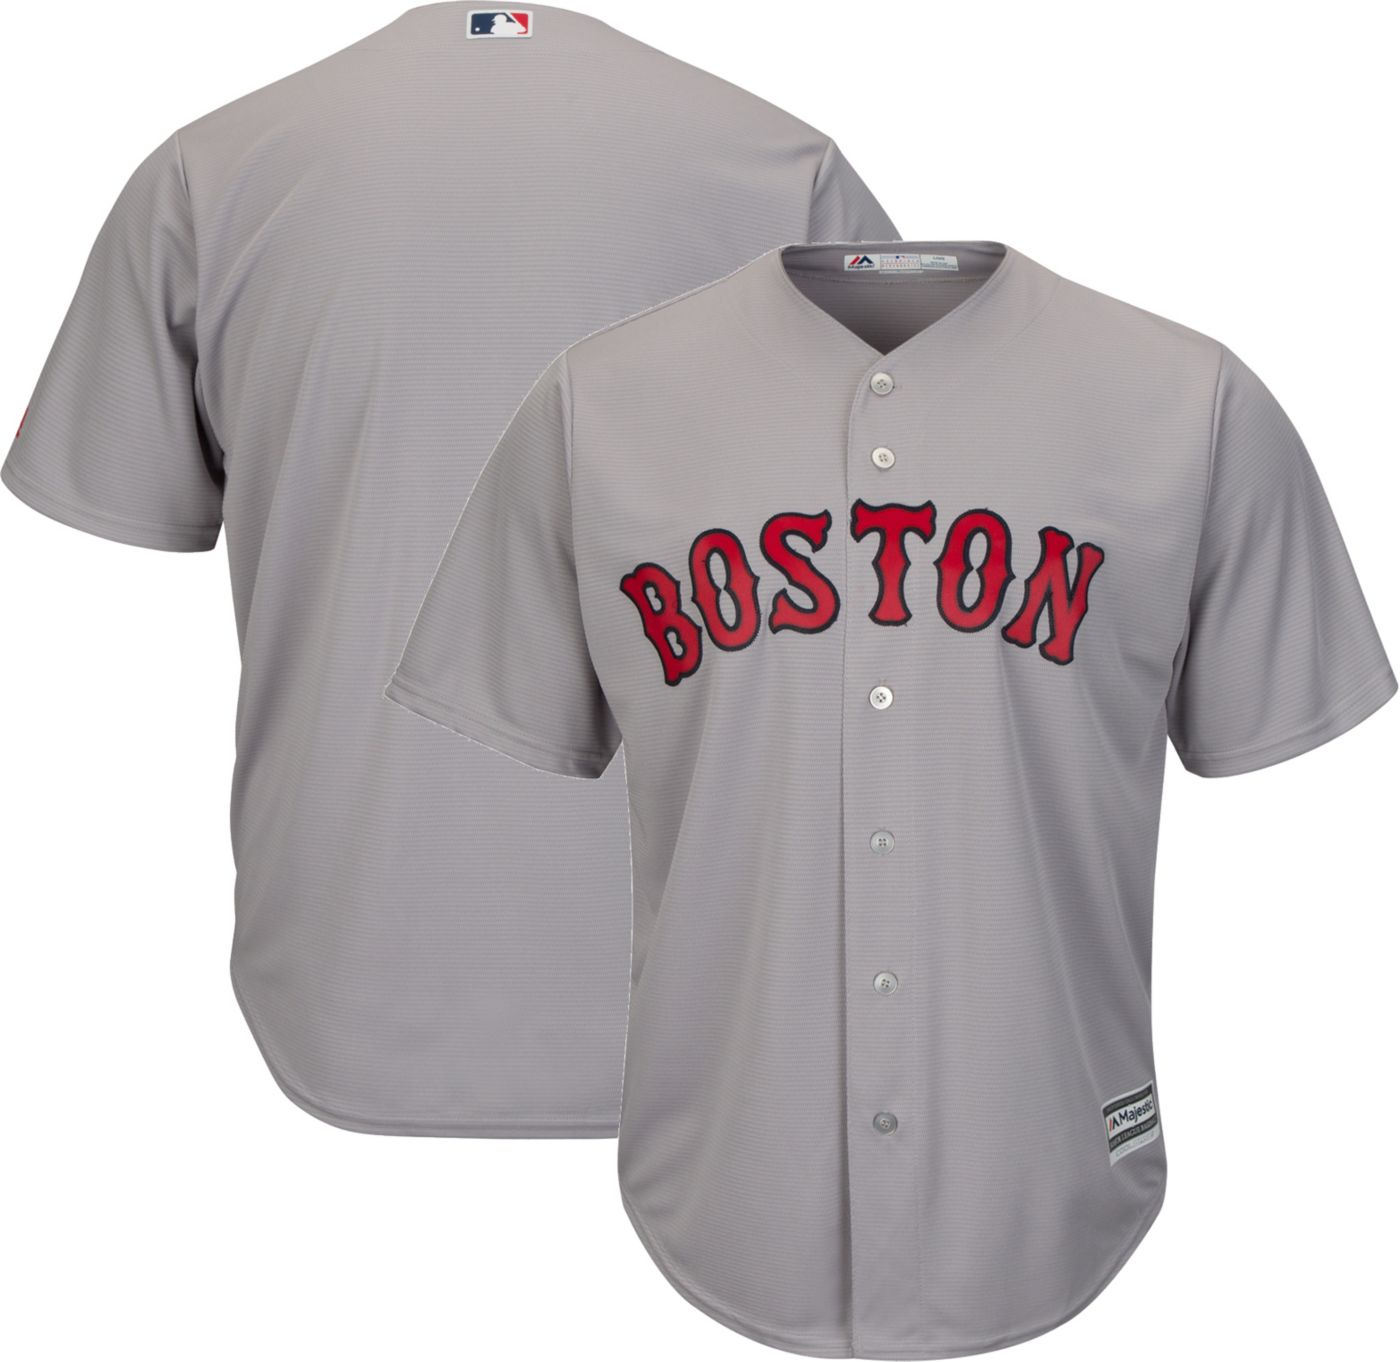 Majestic Men's Replica Boston Red Sox Cool Base Road Grey Jersey